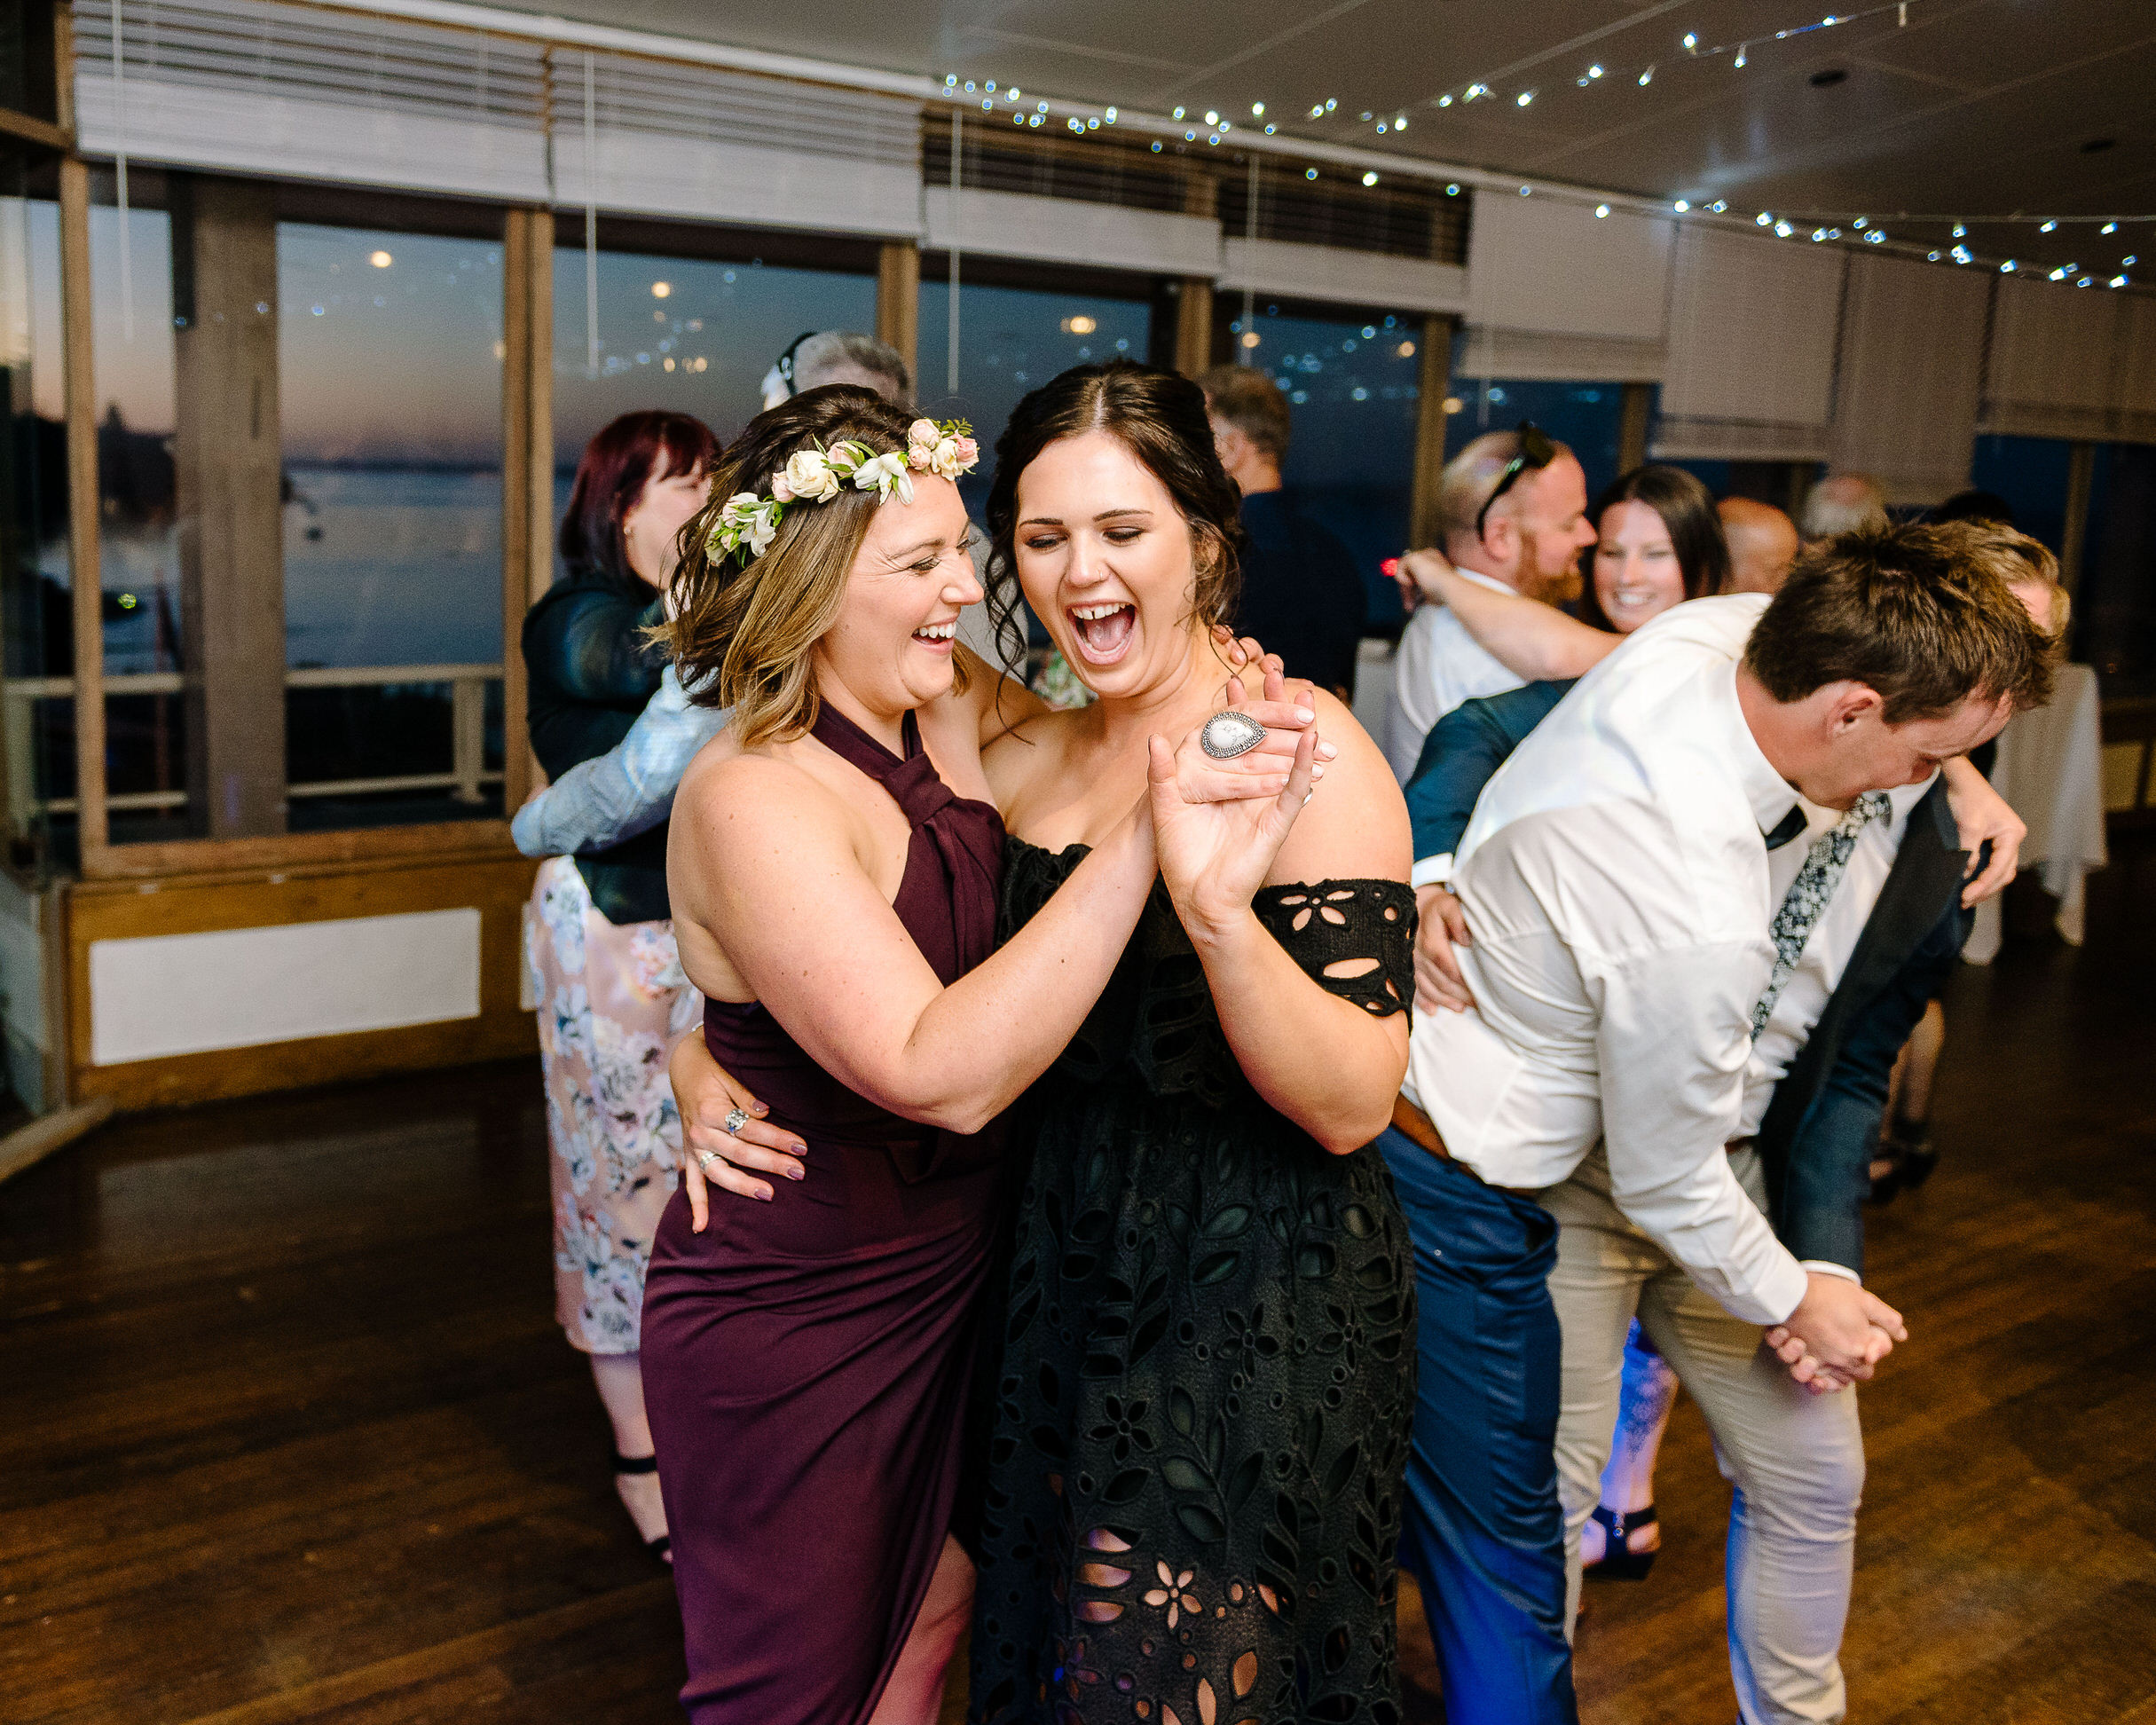 Justin_And_Jim_Photography_Portsea_Pub_Wedding88.JPG